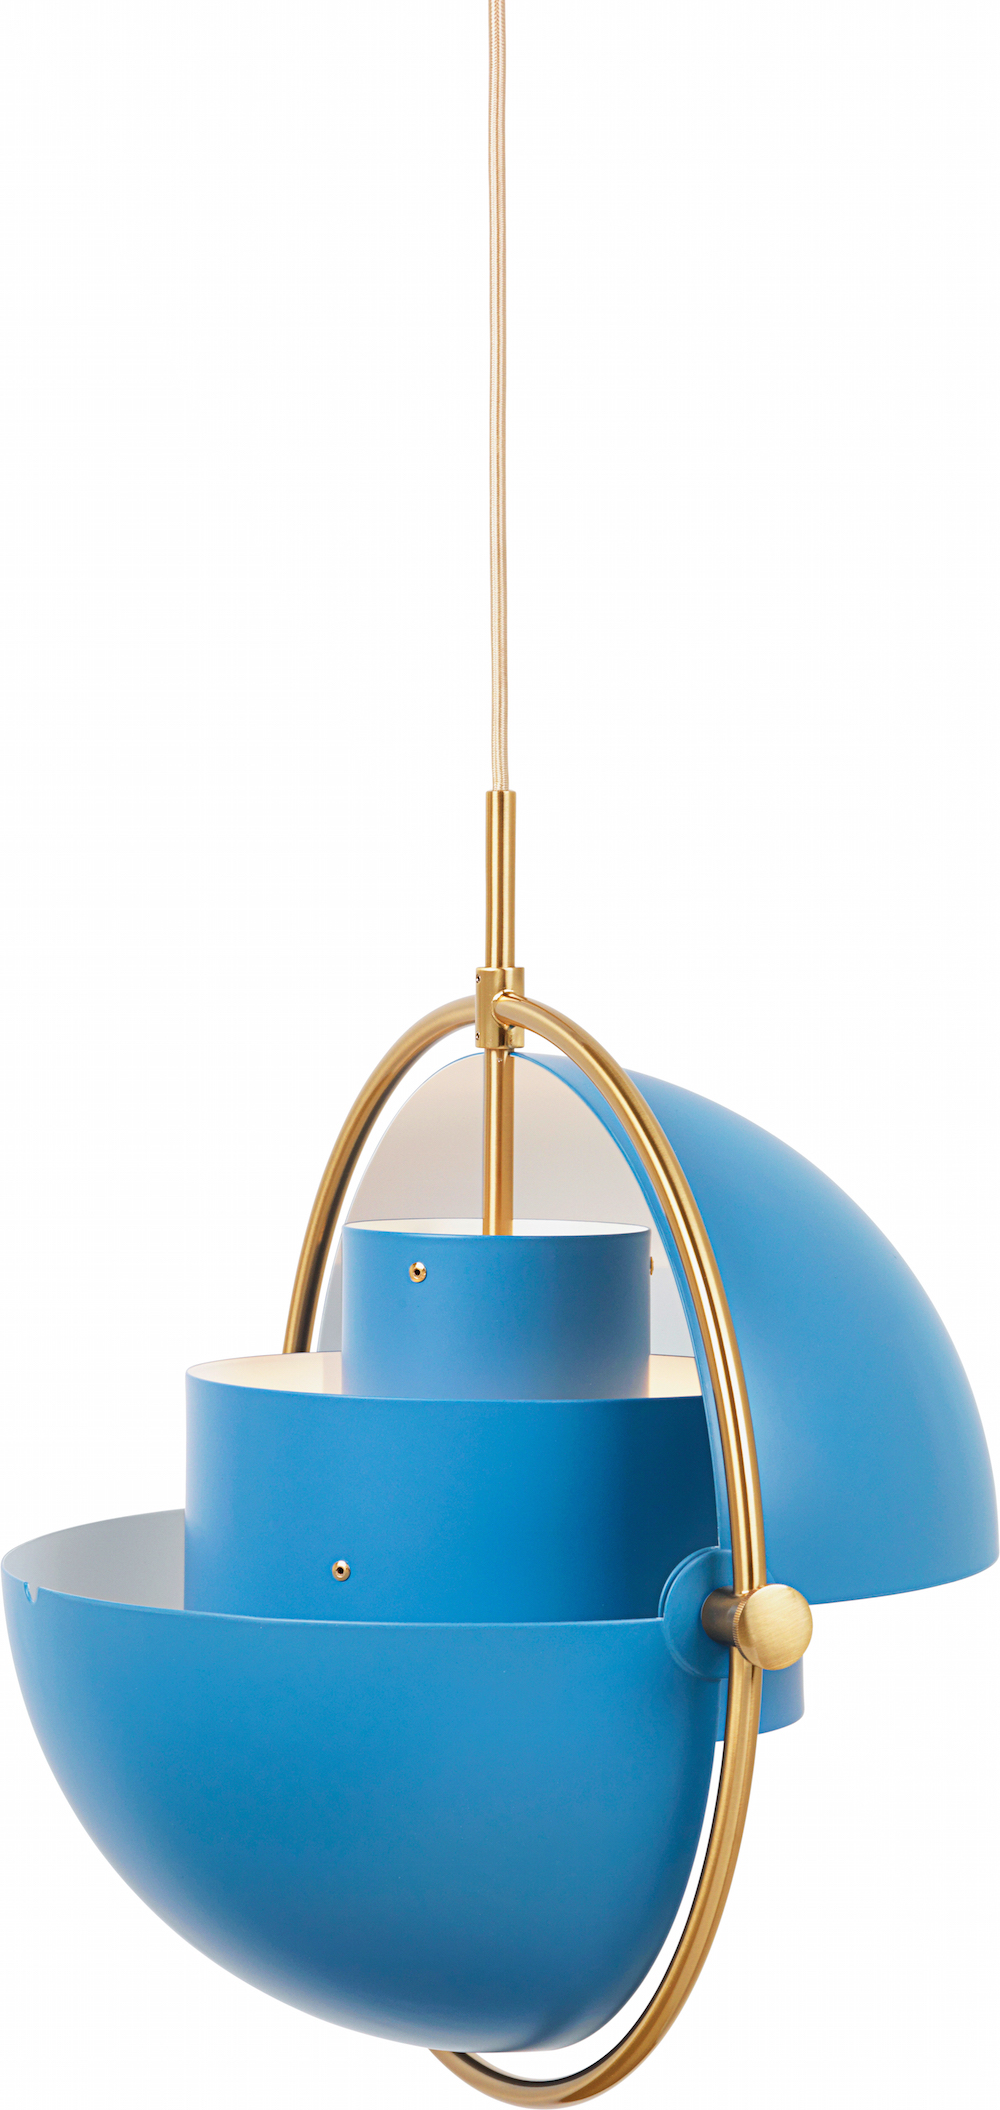 vu au salon maison objet loeilede. Black Bedroom Furniture Sets. Home Design Ideas